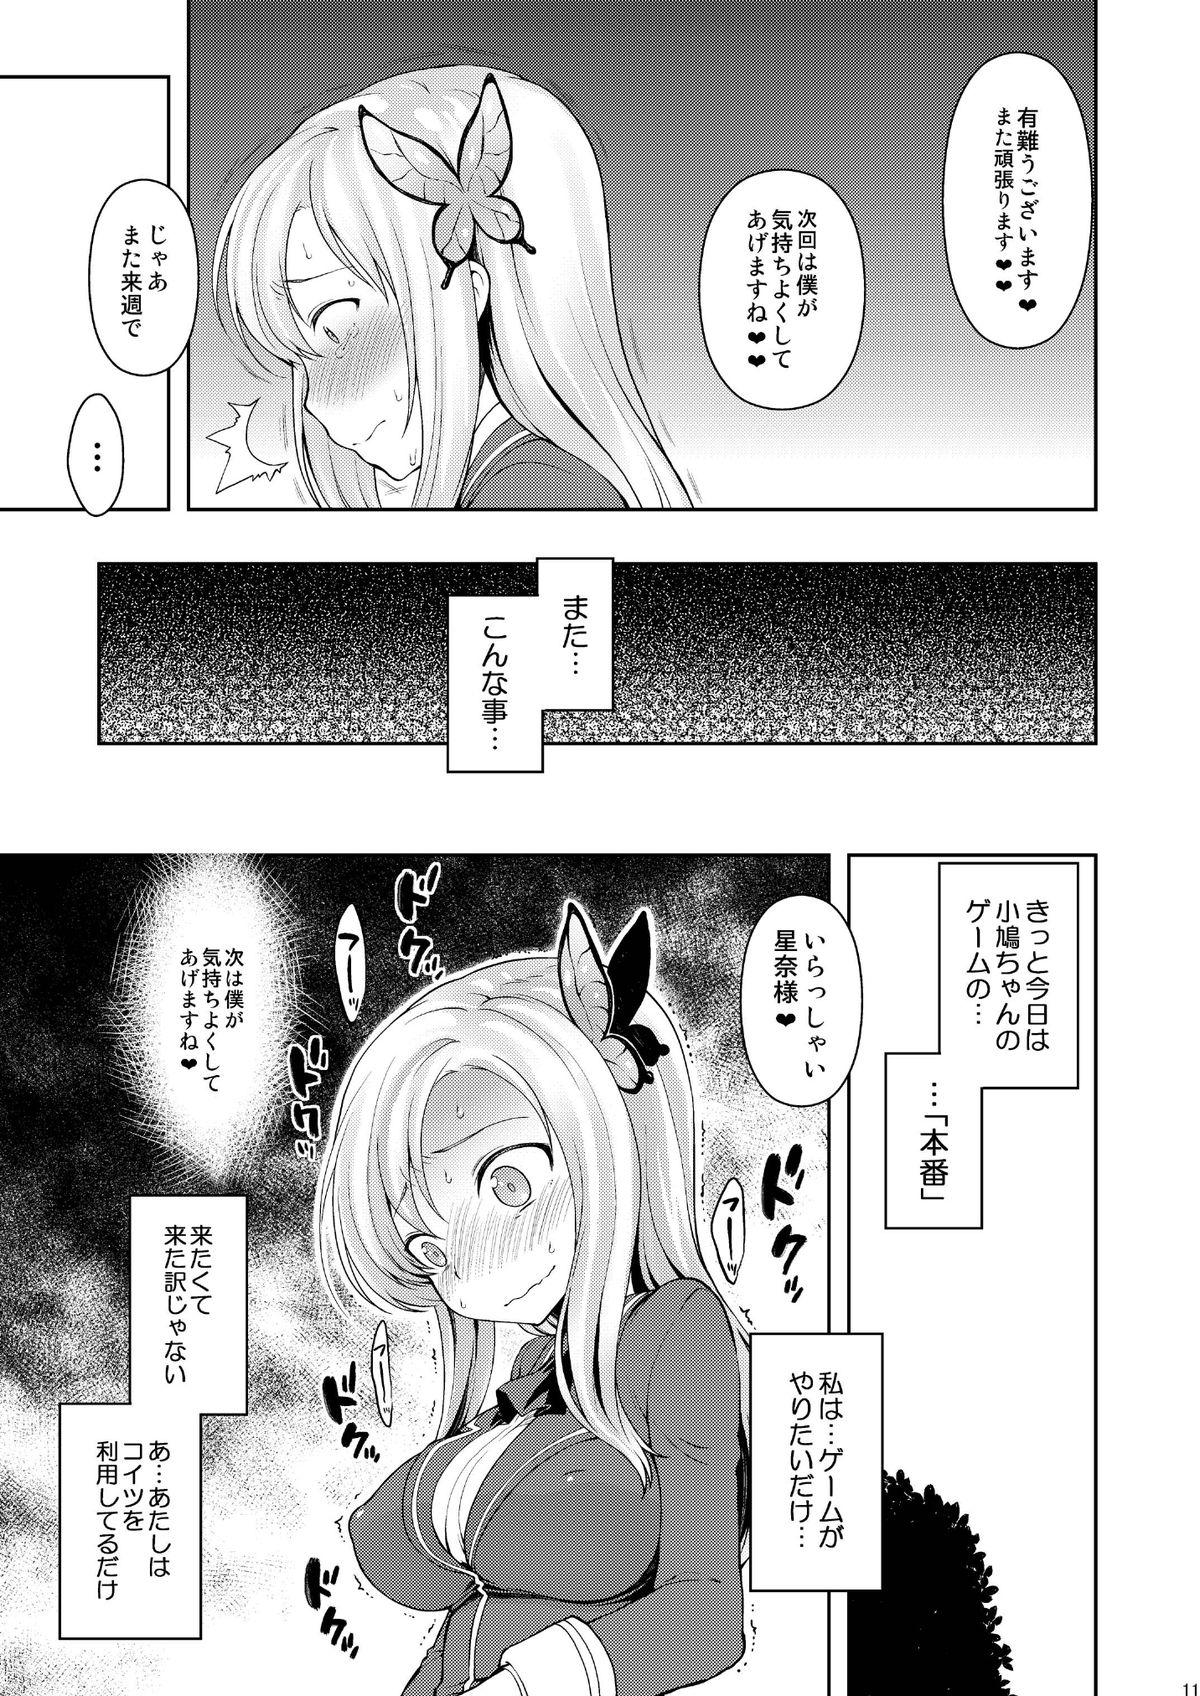 Sena-sama Fuhihi 10